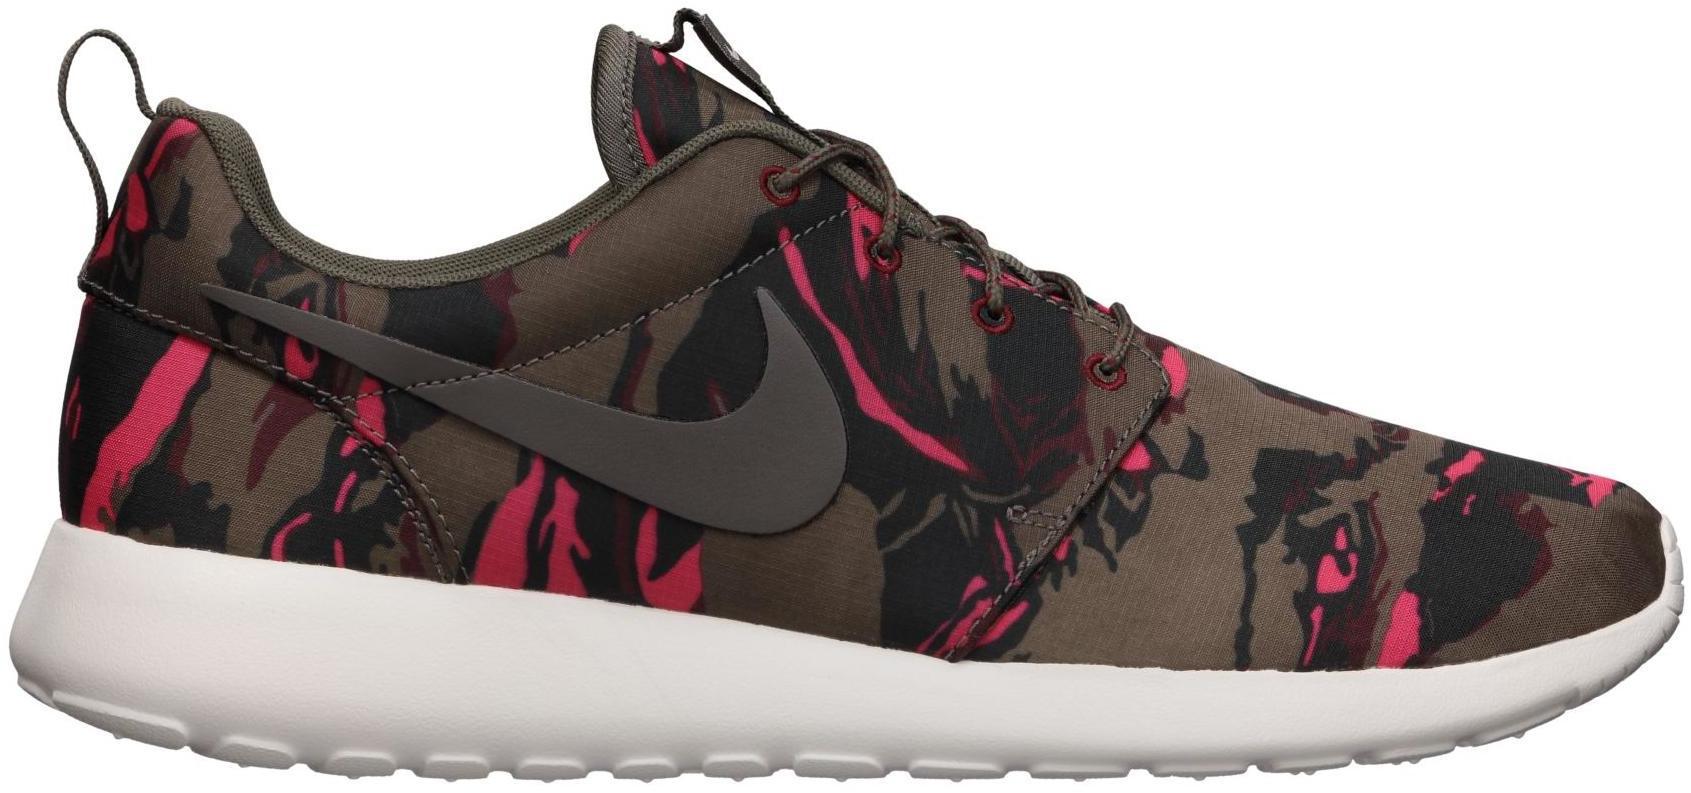 Nike Roshe Run Brown Tiger Camo